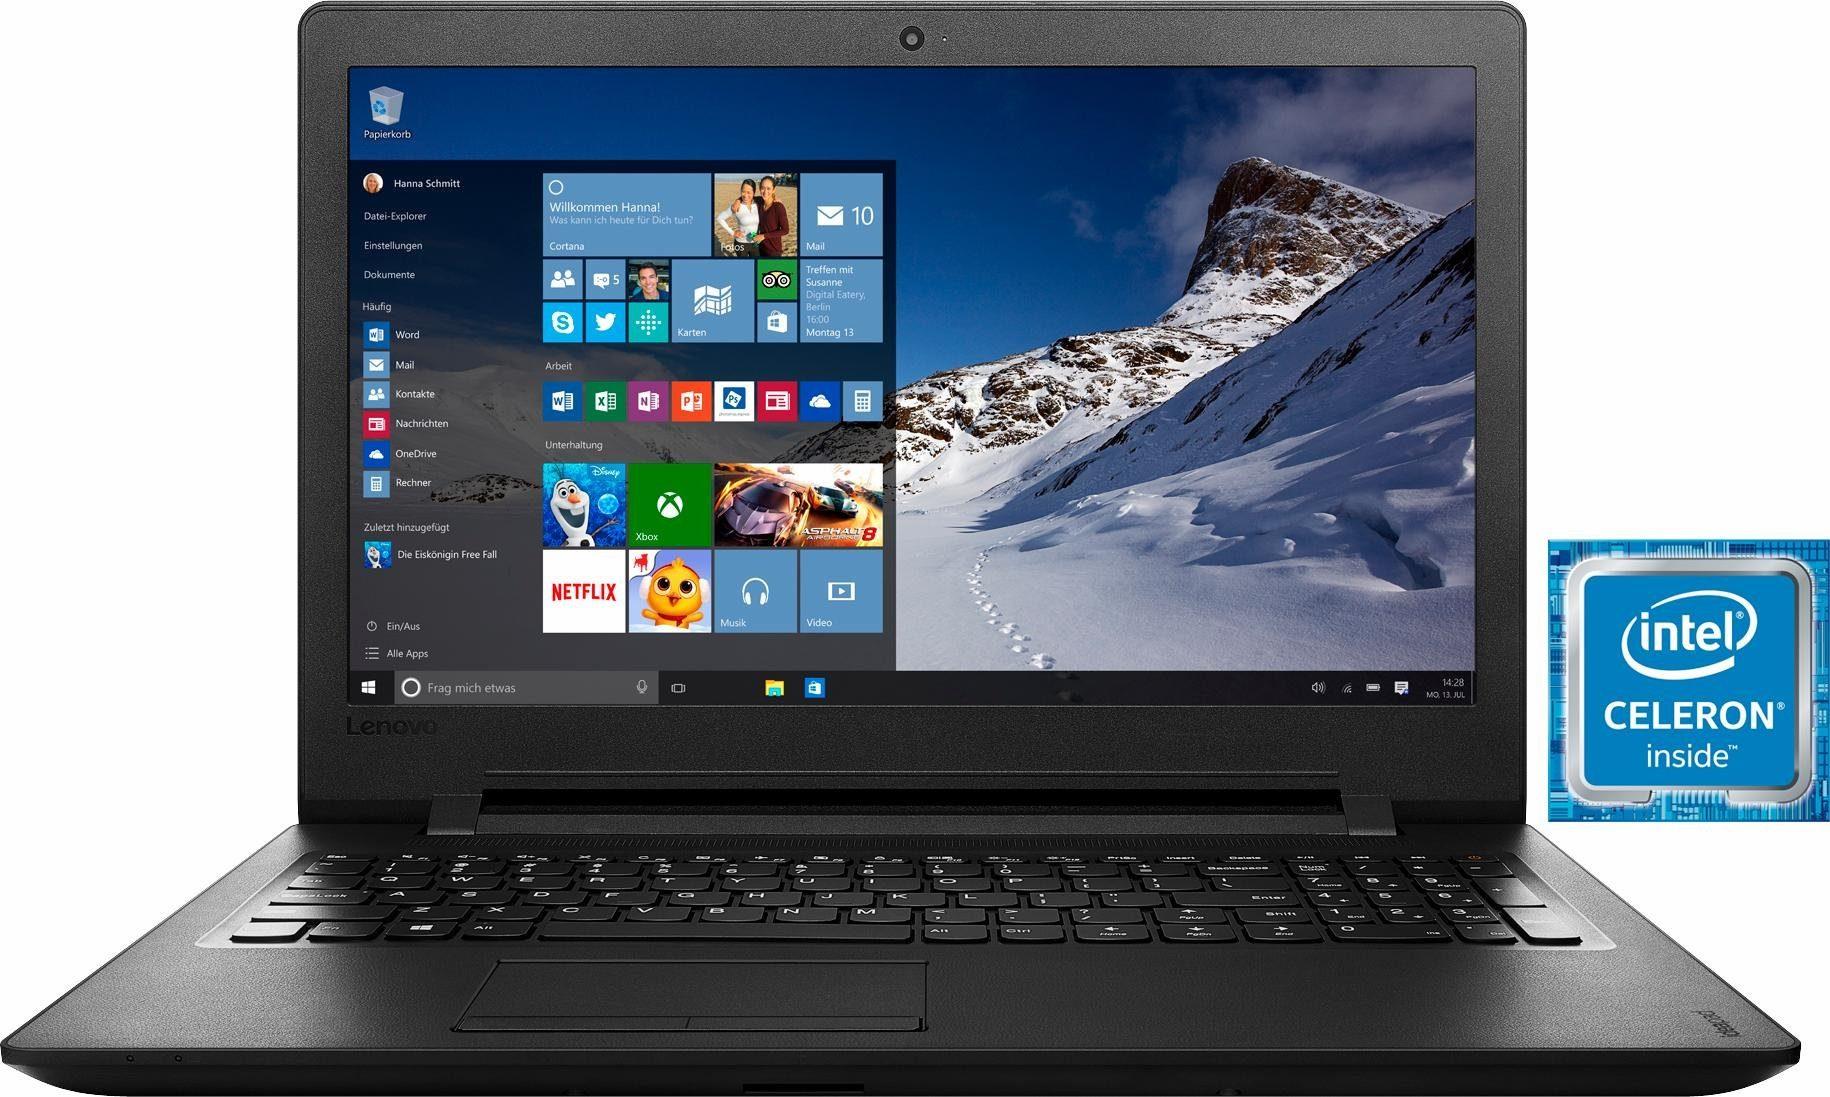 Lenovo Ideapad 110-15IBR Notebook, Intel® Celeron™, 39,6 cm (15,6 Zoll), 500 GB Speicher